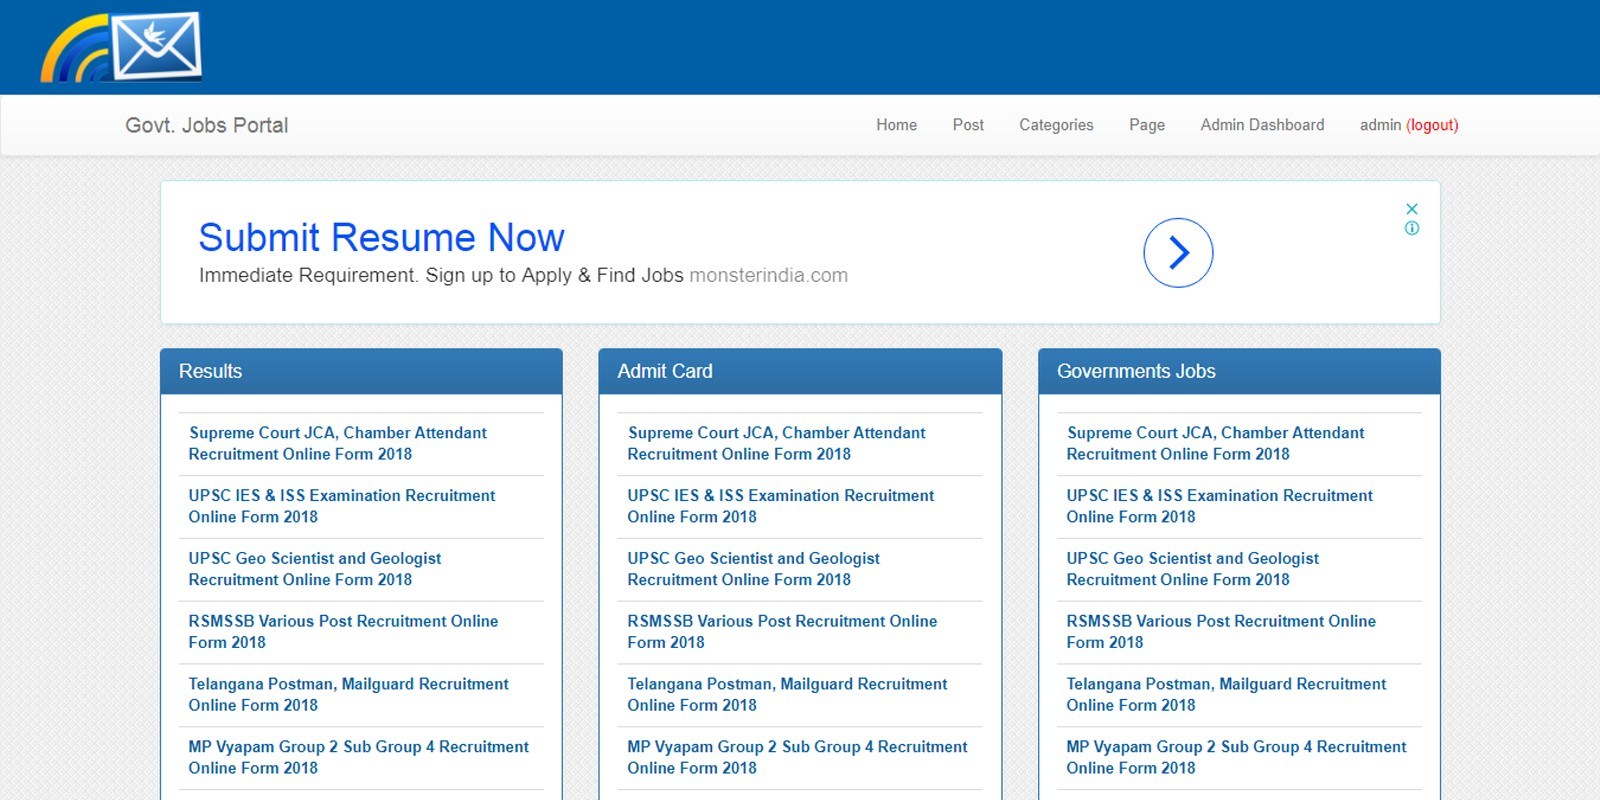 Govt v2.1 - .NET job portal